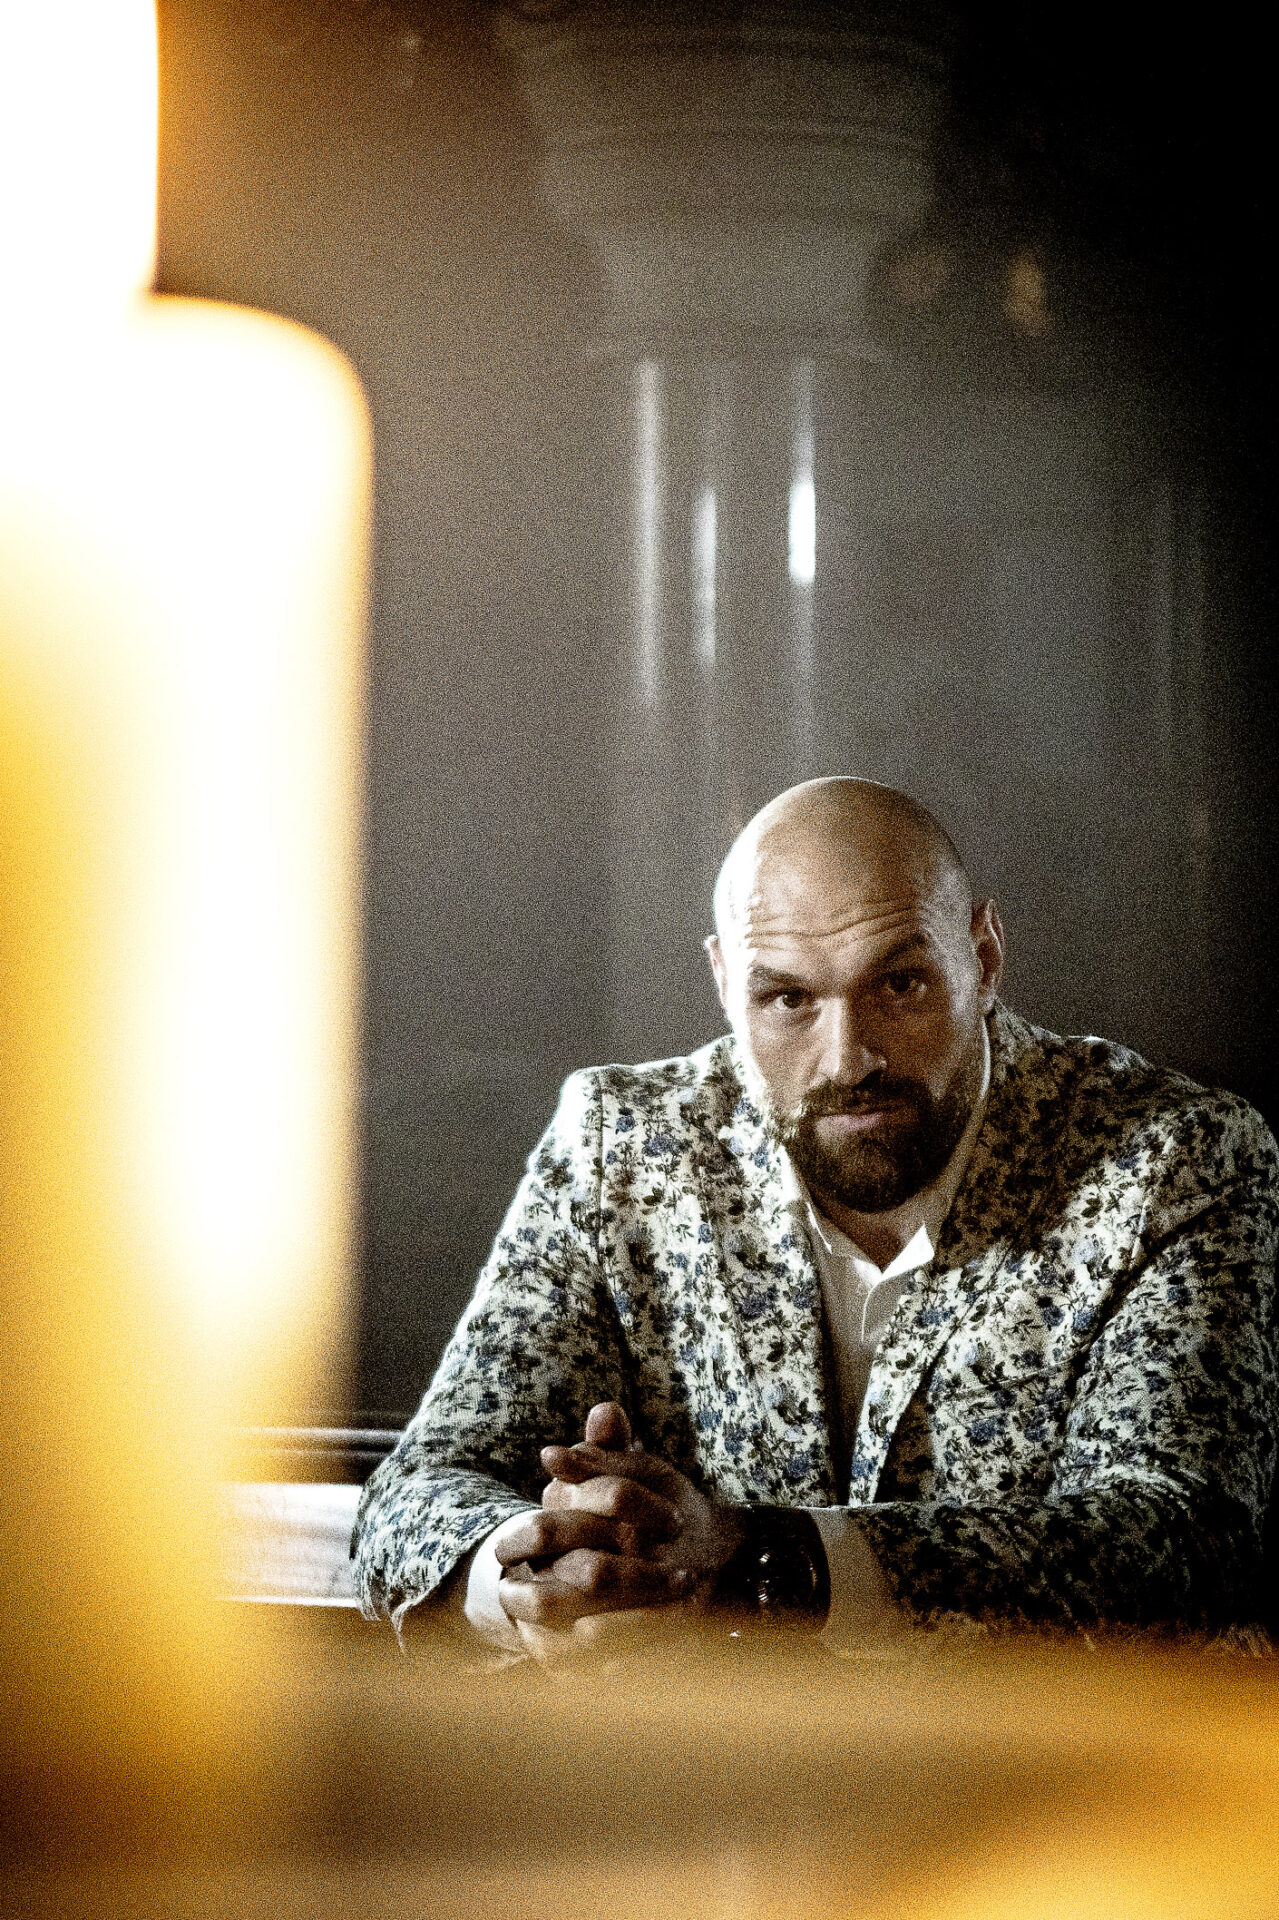 celebrity-portrait-photography-of-the-gypsy-king-tyson-fury